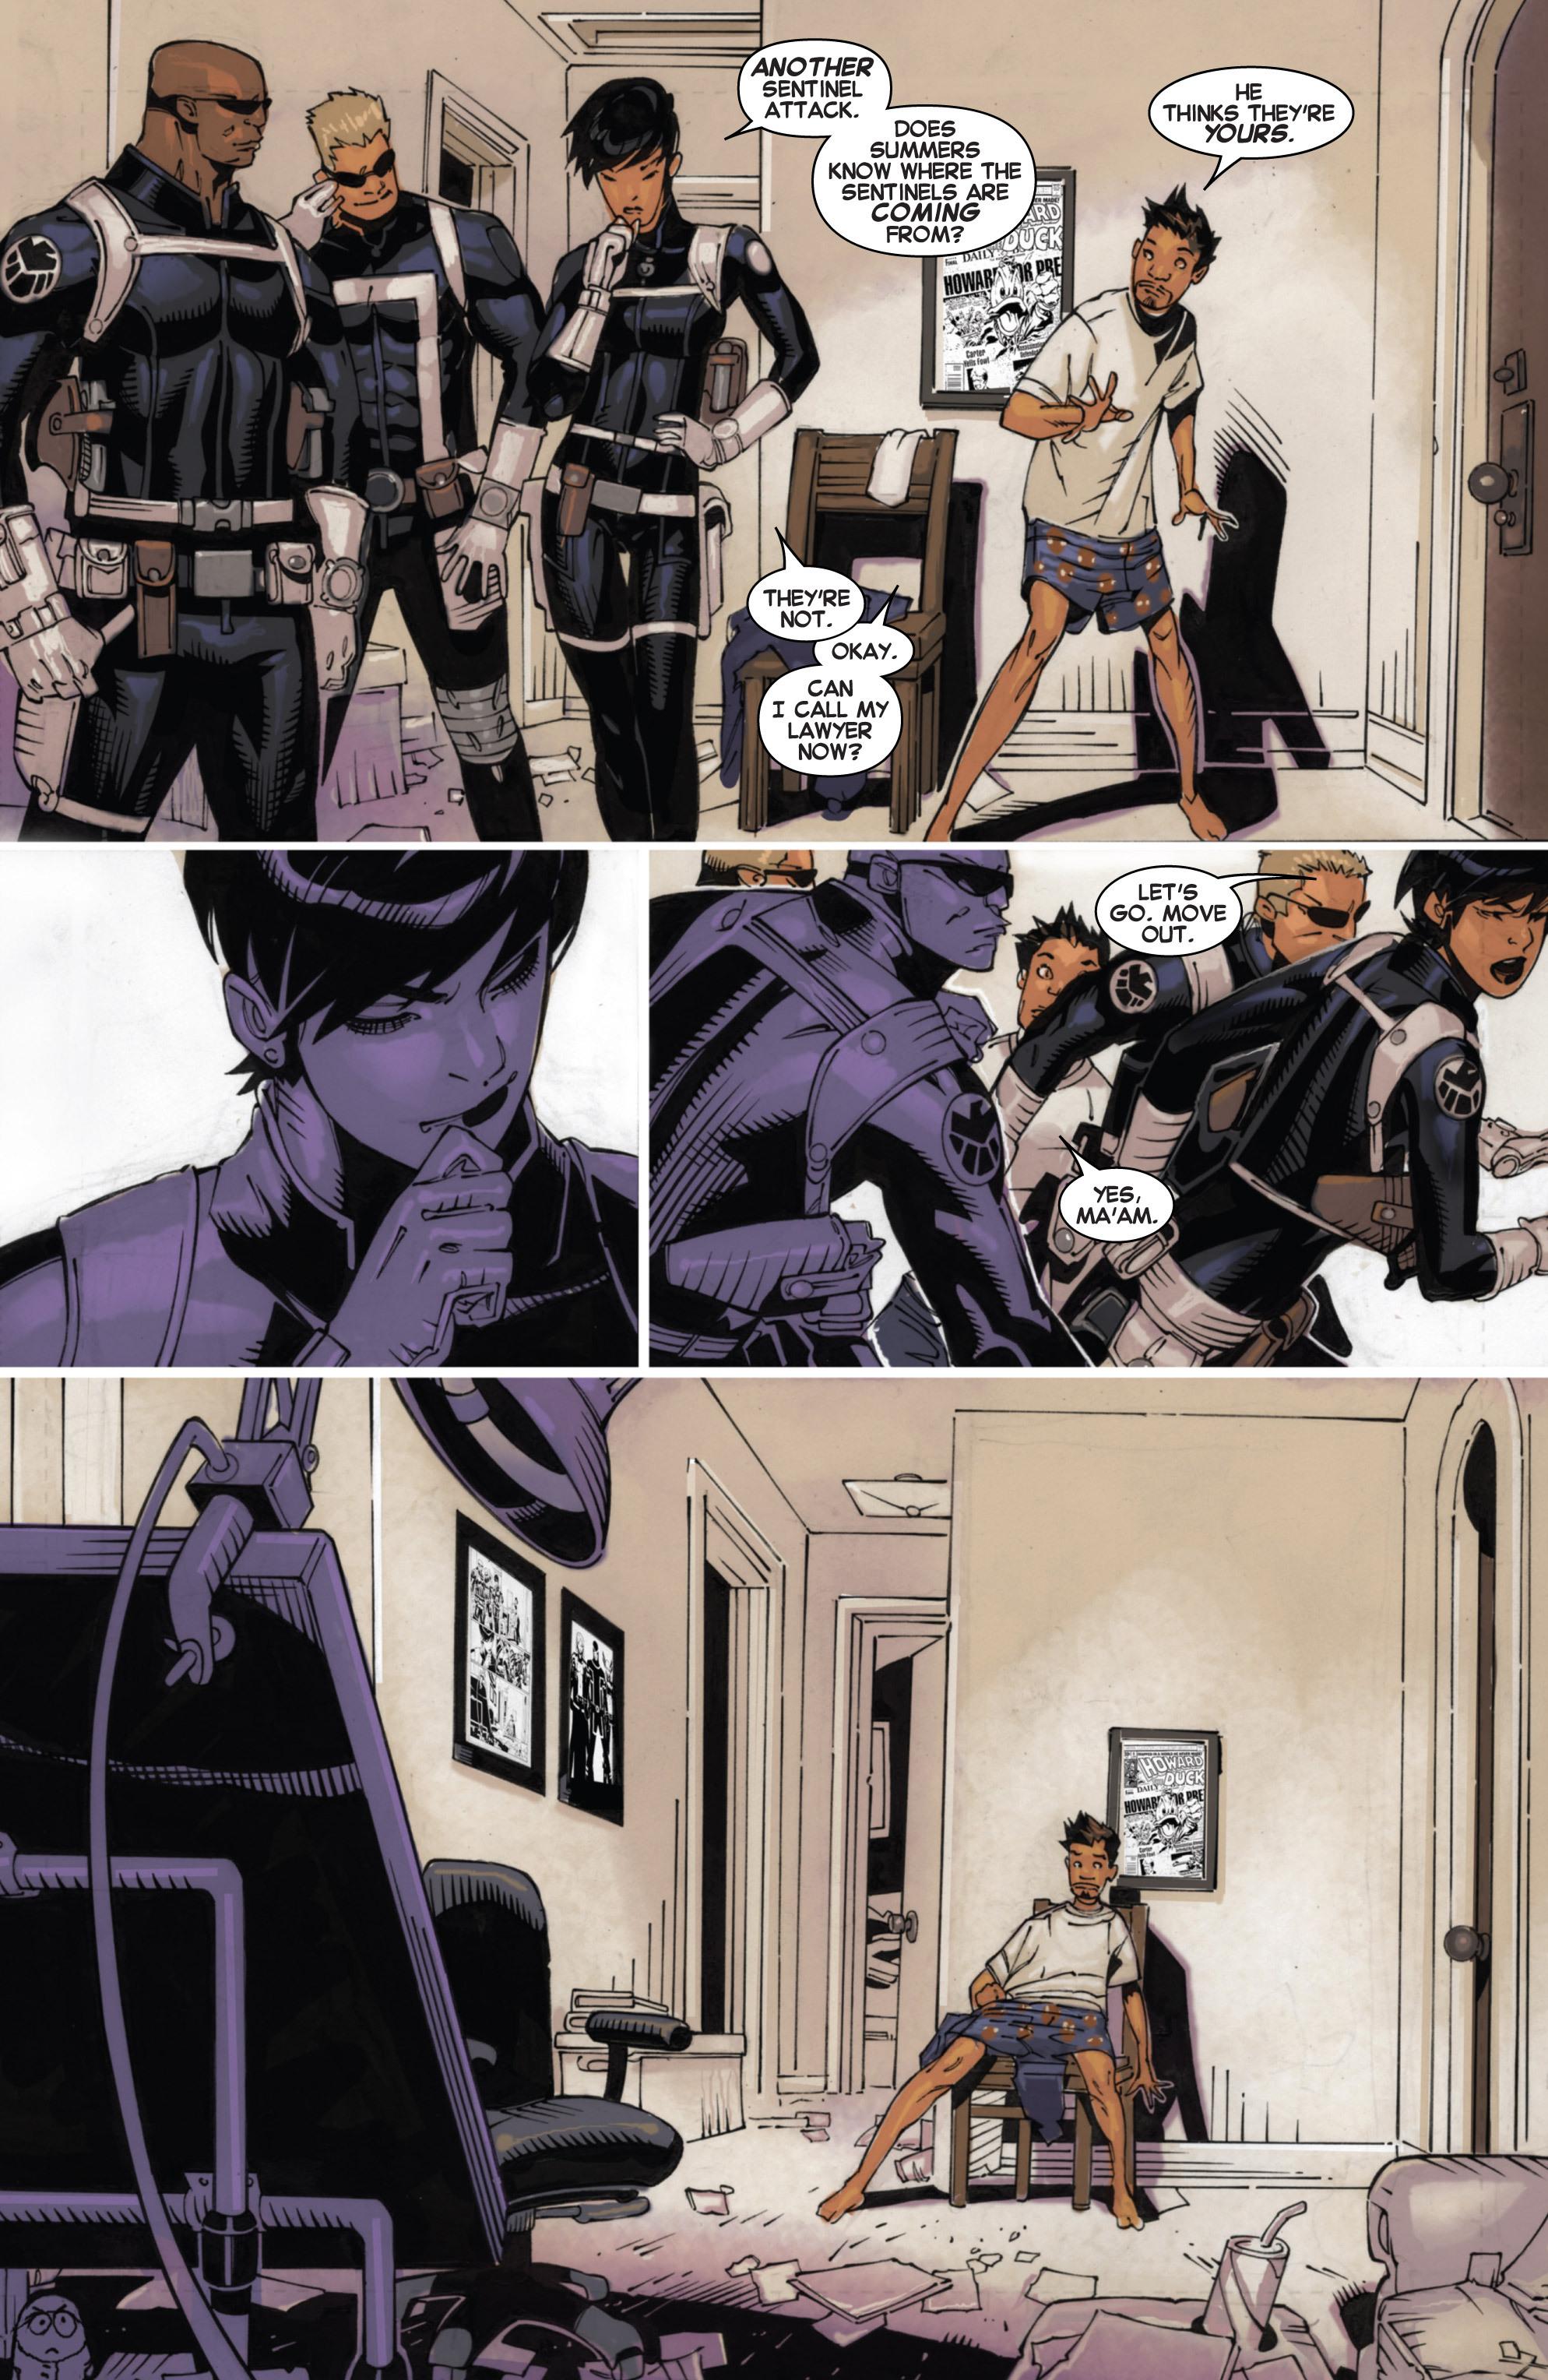 Read online Uncanny X-Men (2013) comic -  Issue # _TPB 4 - vs. S.H.I.E.L.D - 24